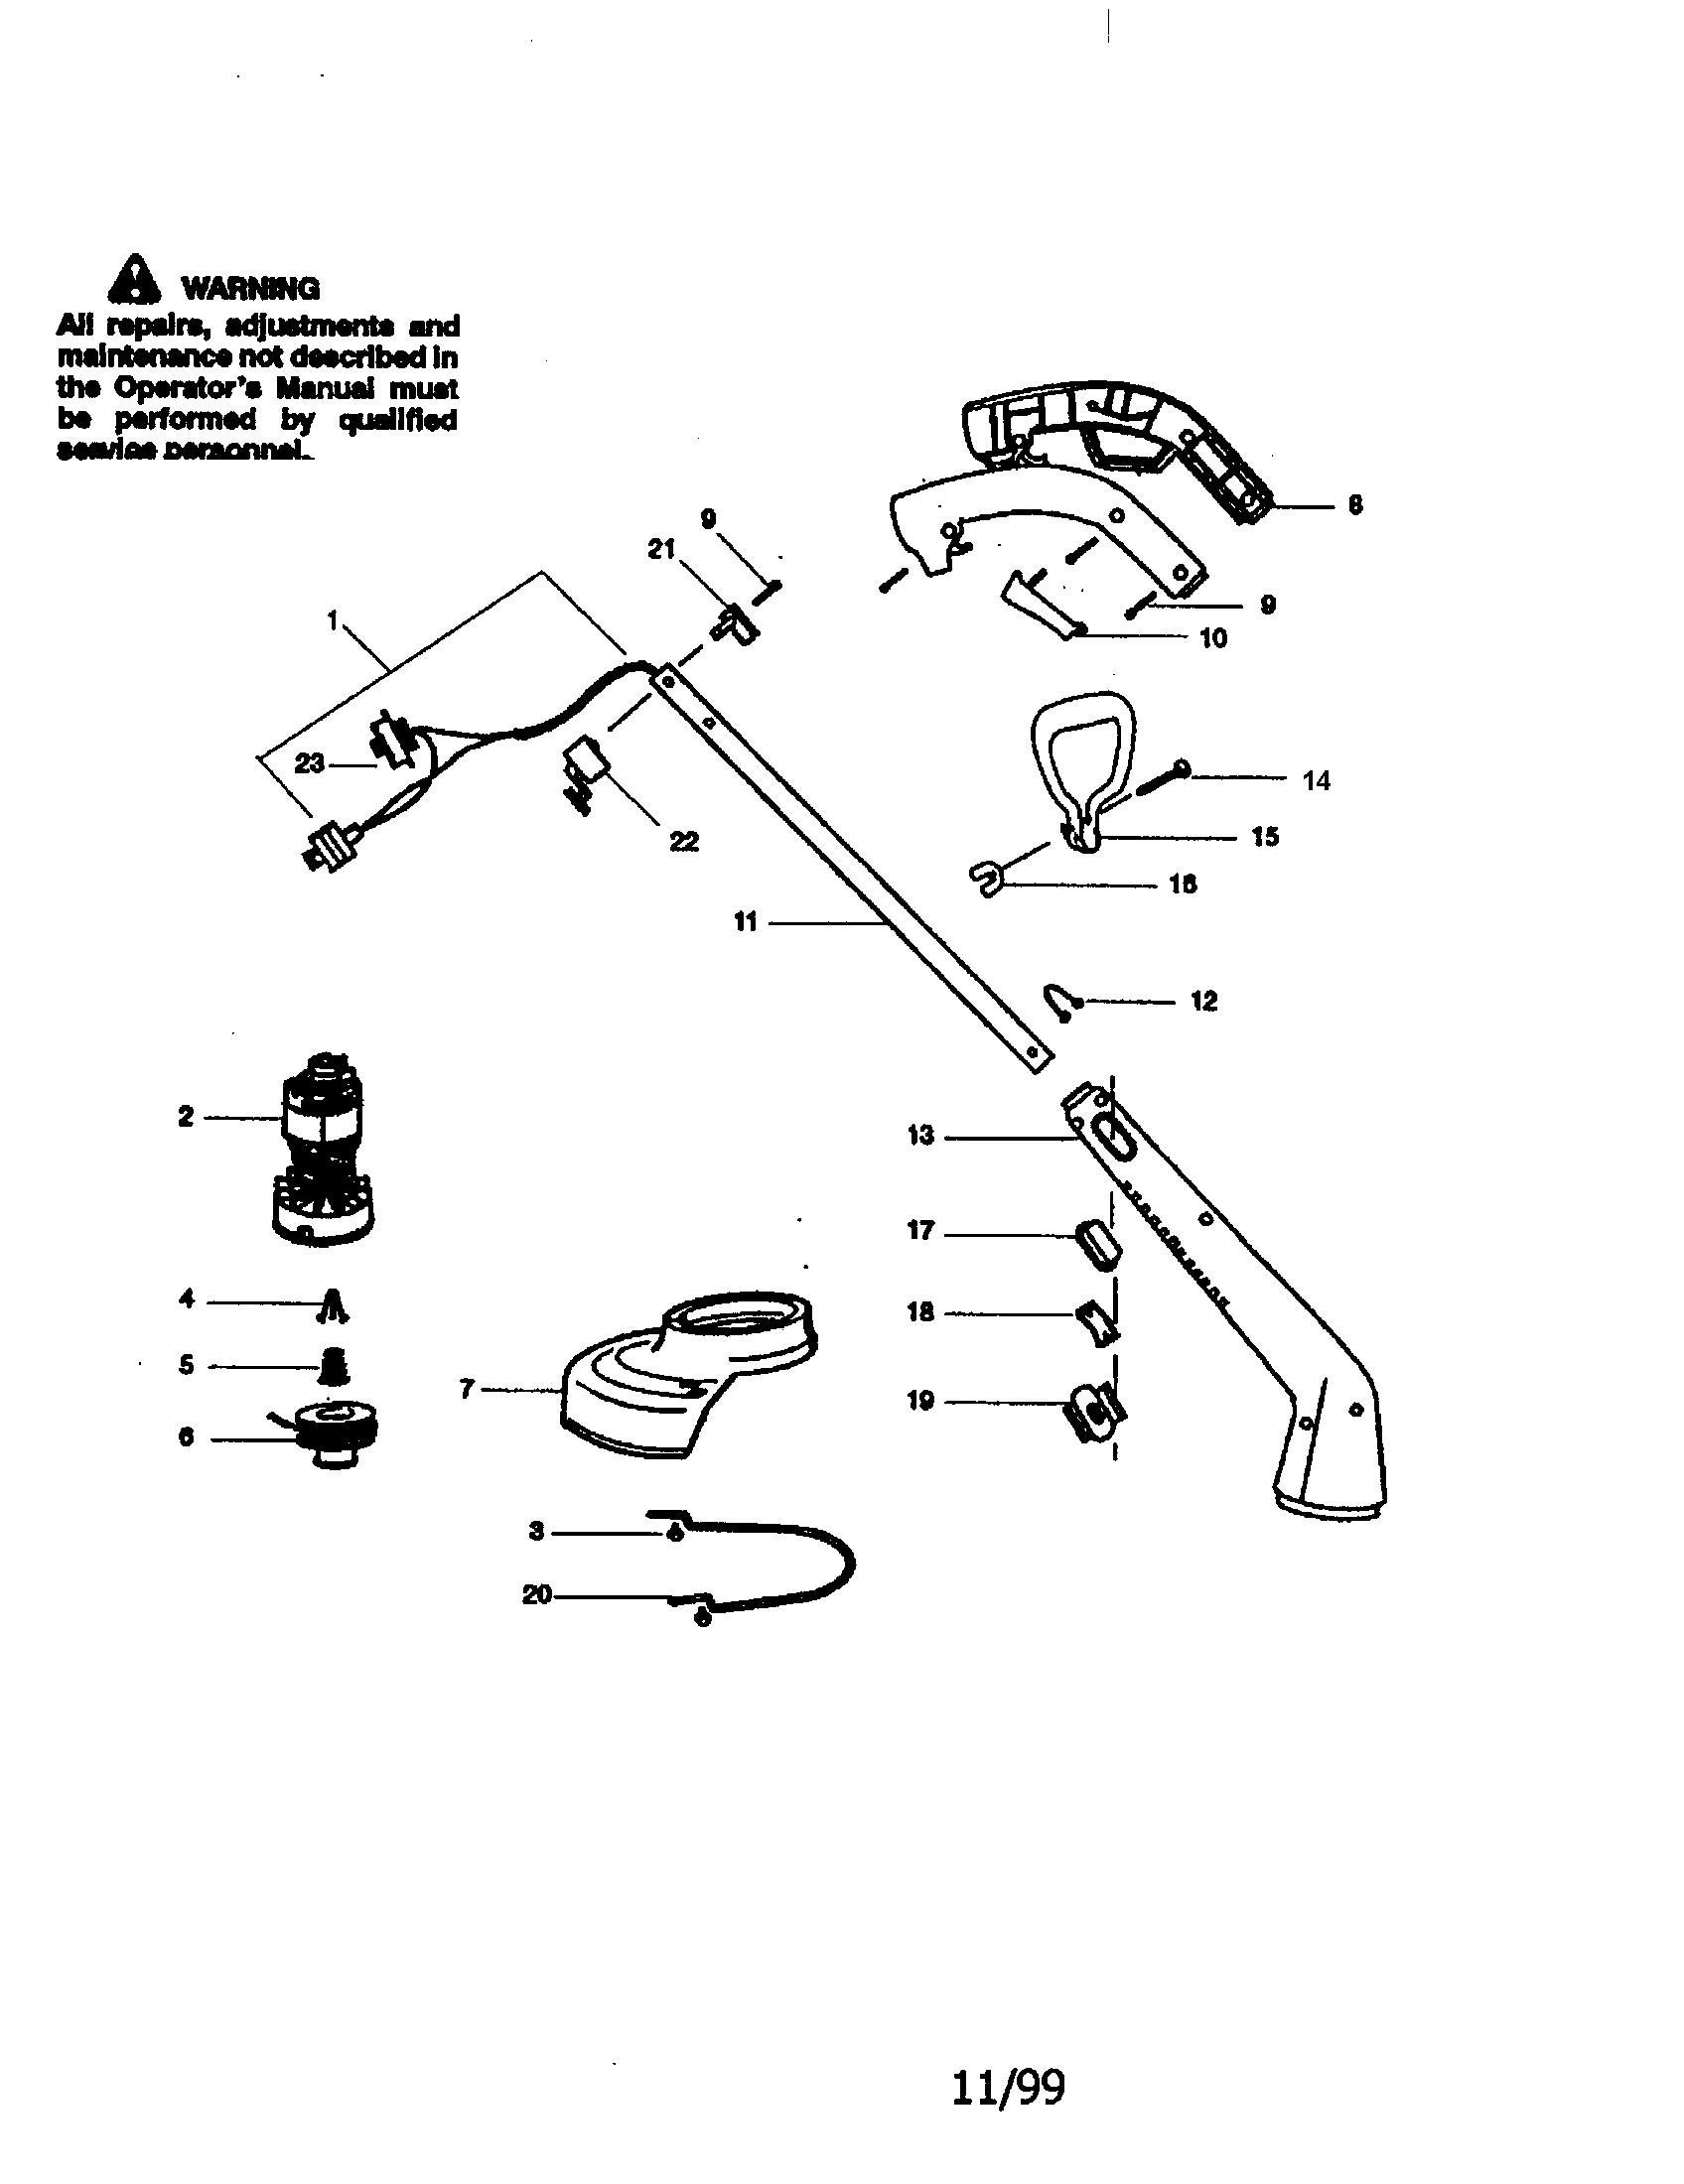 Craftsman Weedwacker Parts Model Sears Partsdirect